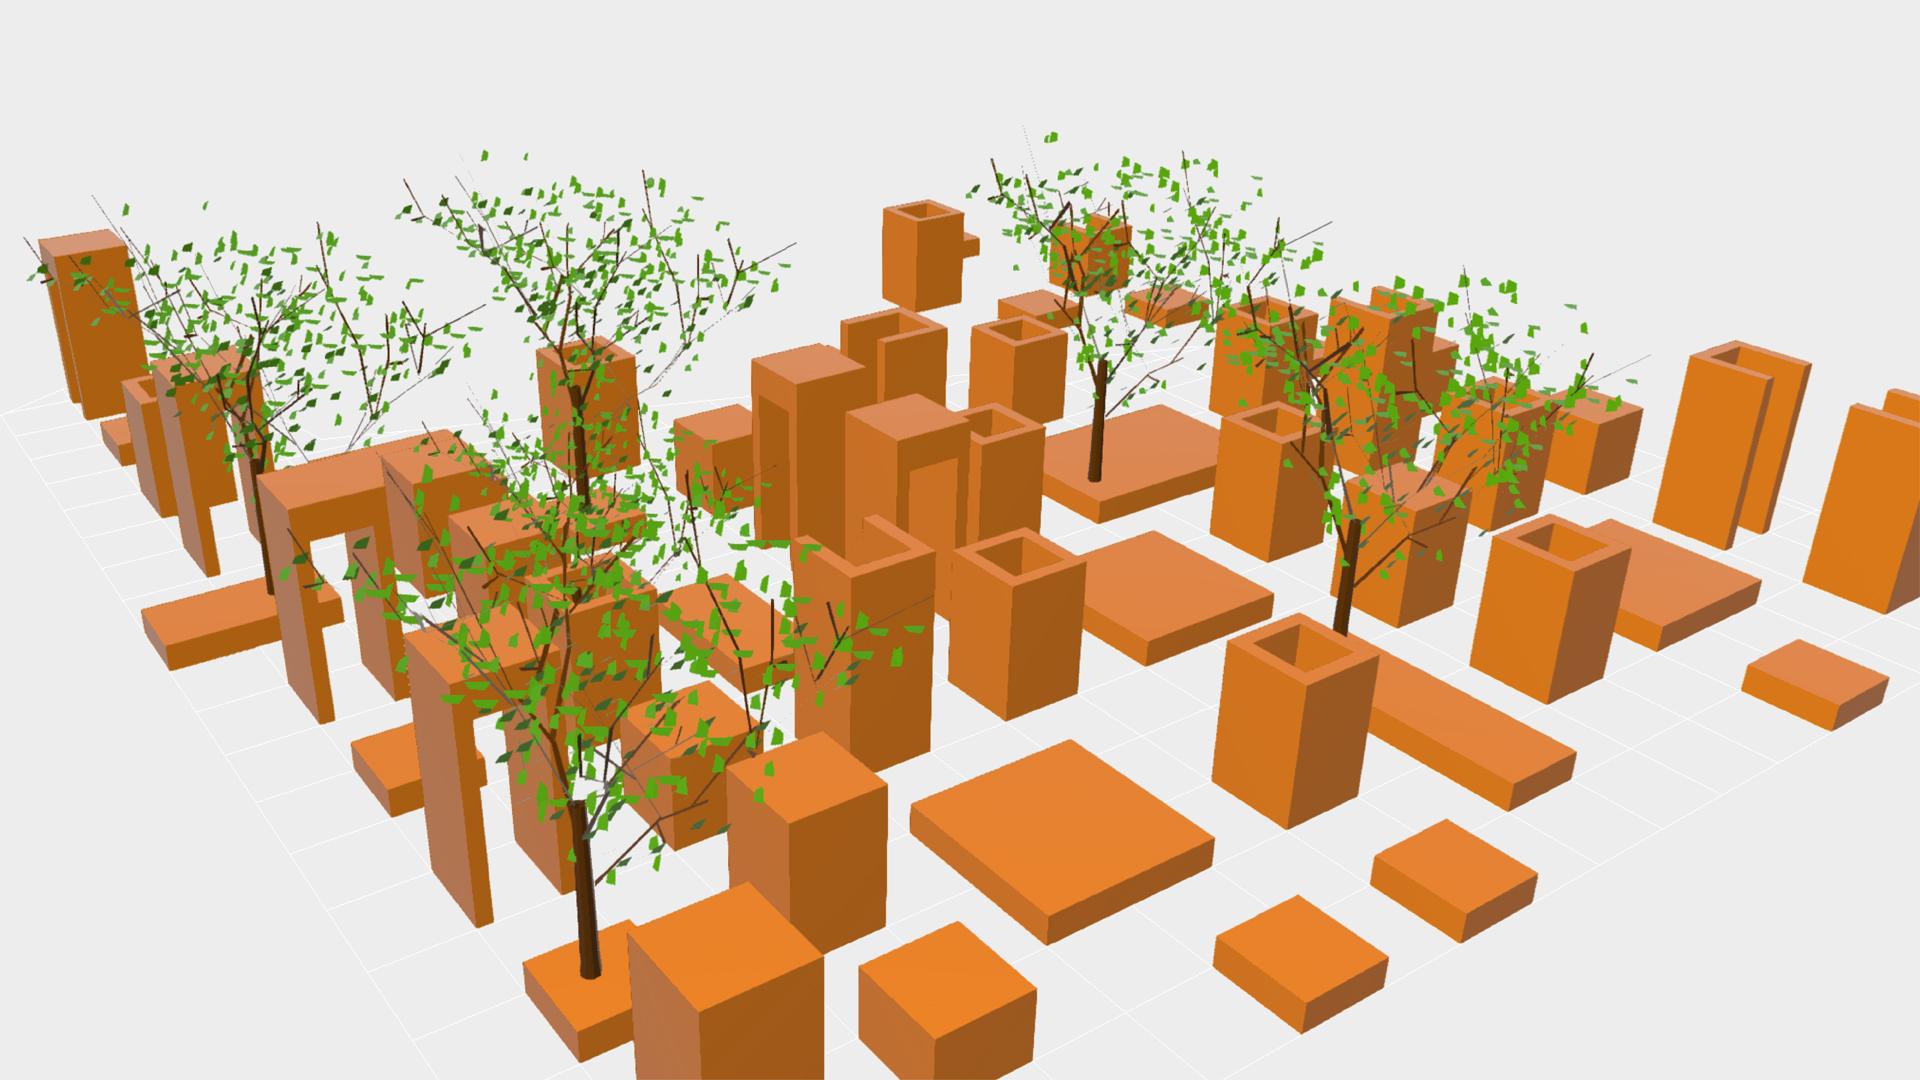 Revit Architecture: Advanced Modeling